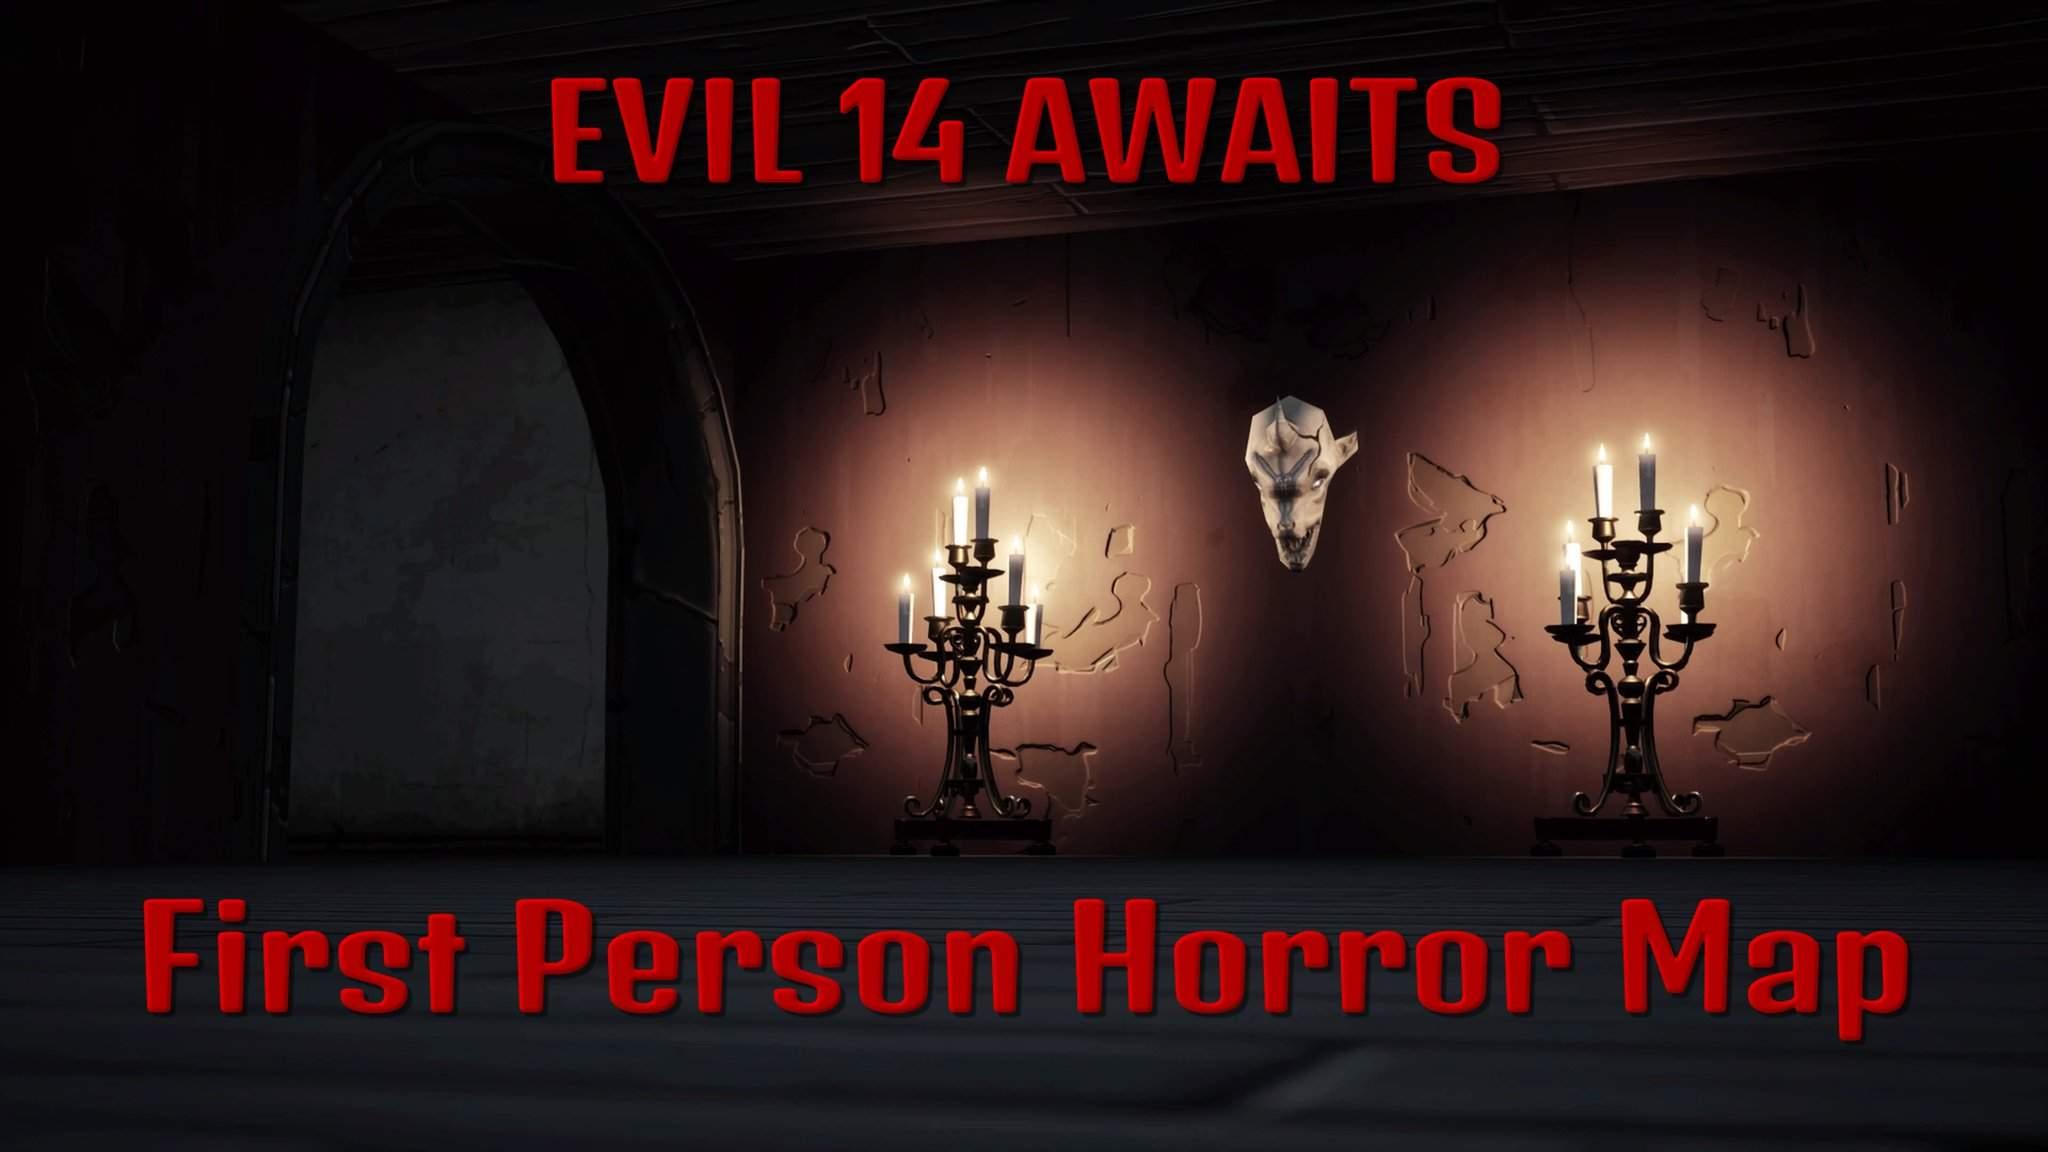 Top Scarrest Fortnite Maps Top 10 Fortnite Best Horror Maps Gamers Decide